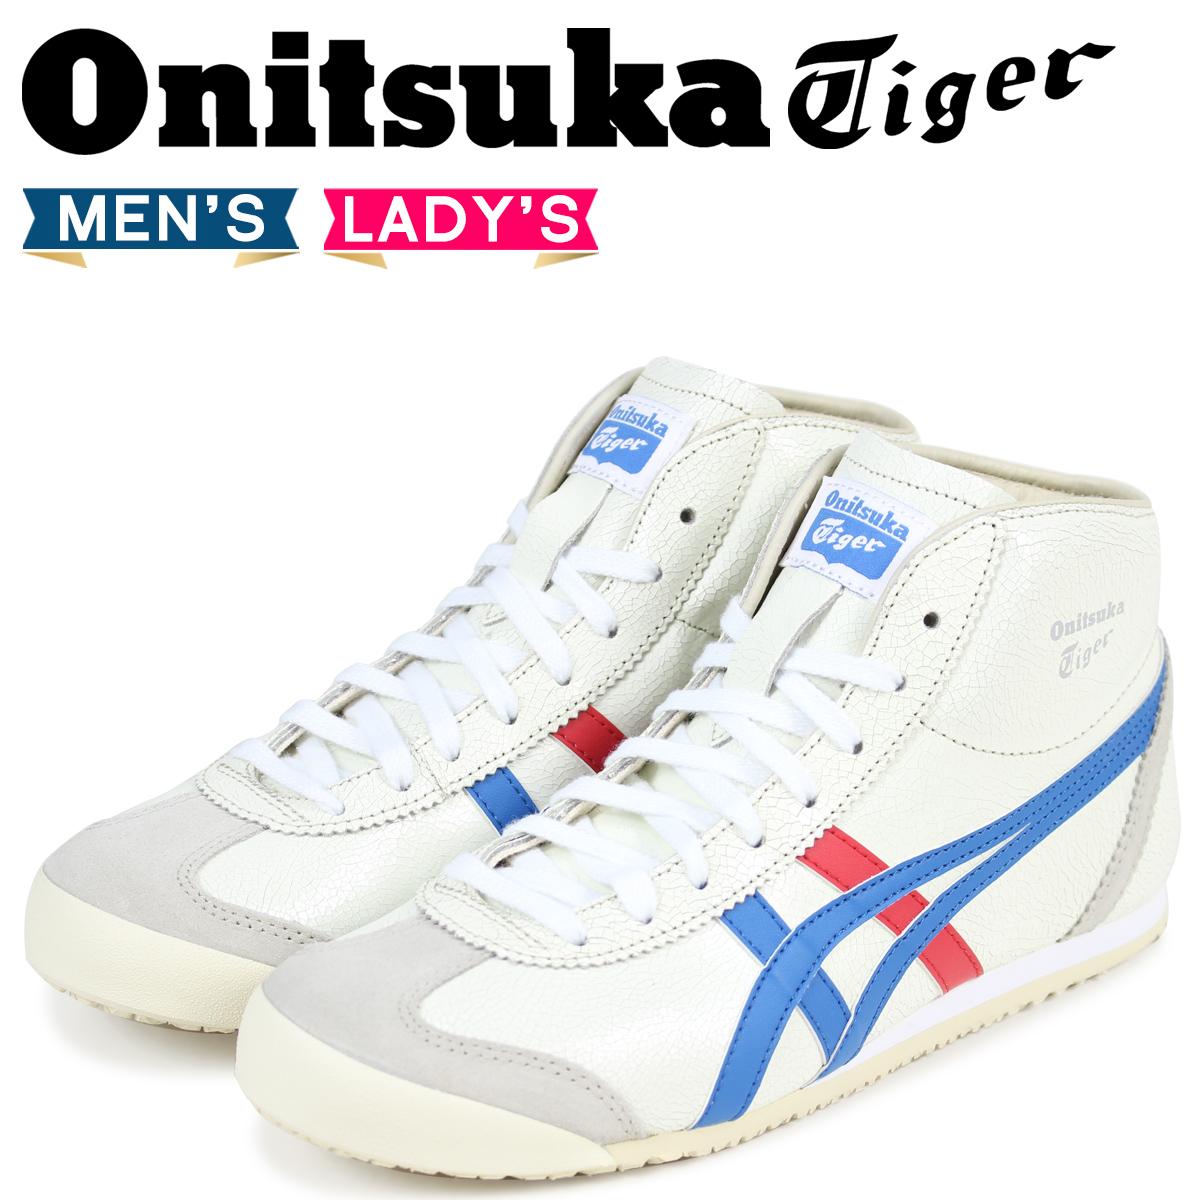 Onitsuka Tiger メキシコ ミッド ランナー オニツカタイガー MEXICO MID RUNNER メンズ スニーカー DL328-0142 THL328-0142 ホワイト